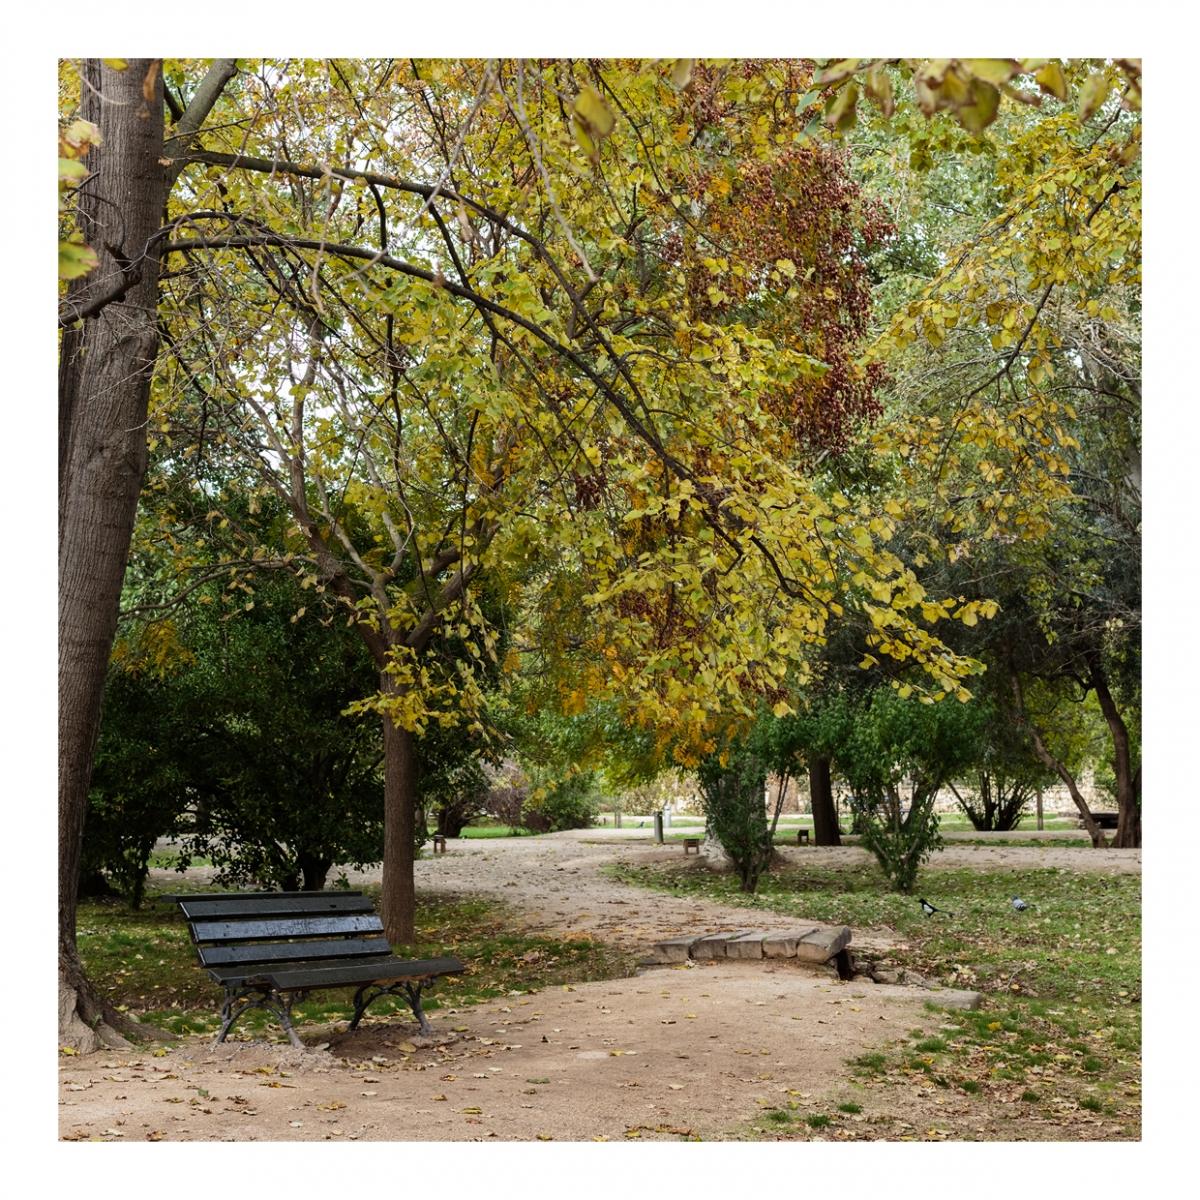 Imagen en la que se ve un parque